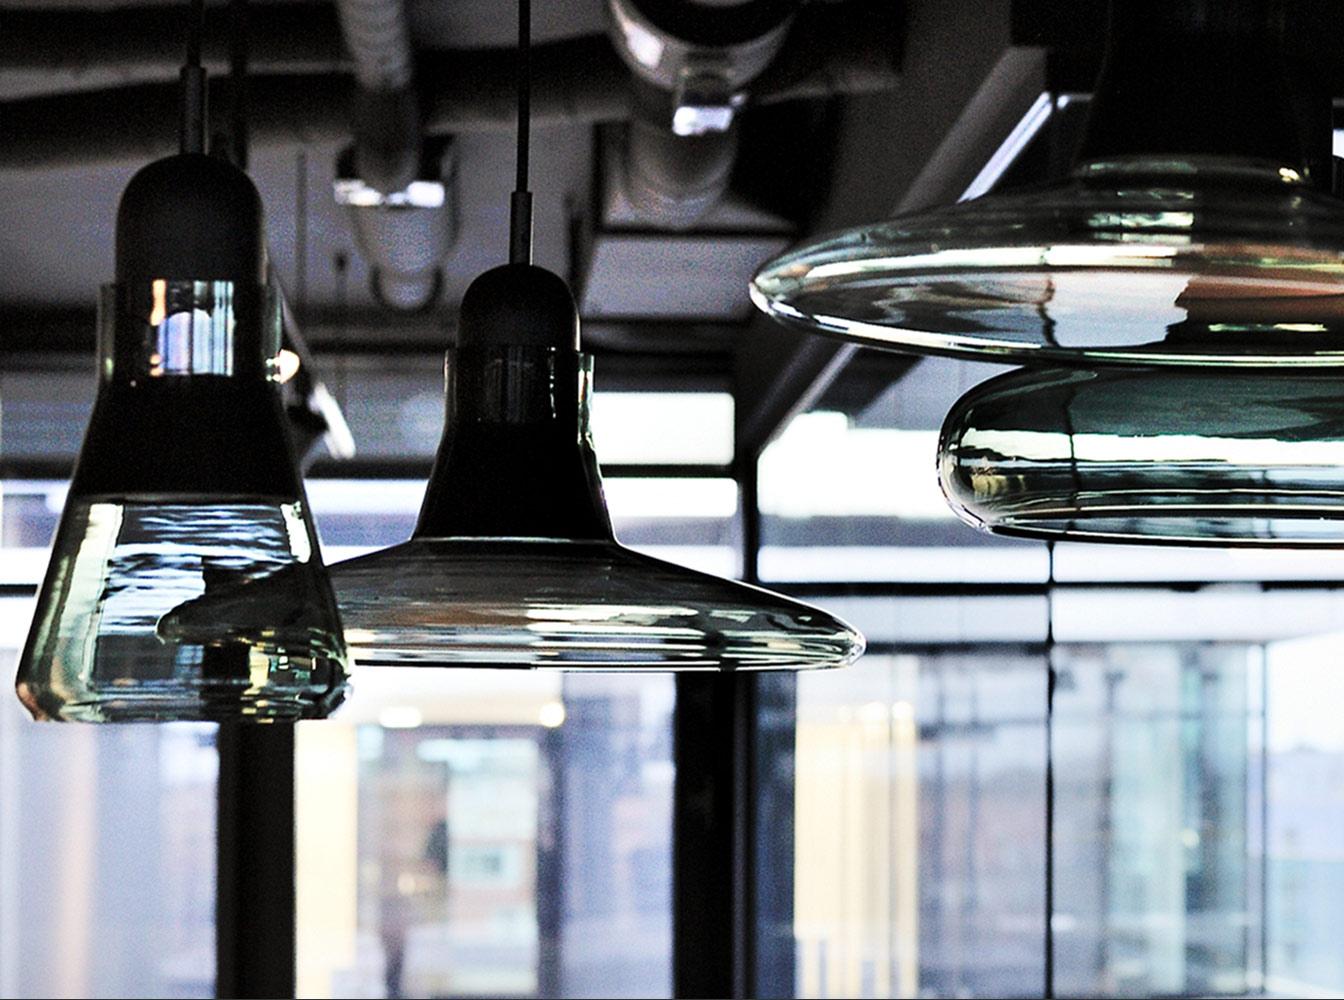 lighting-concept.jpg